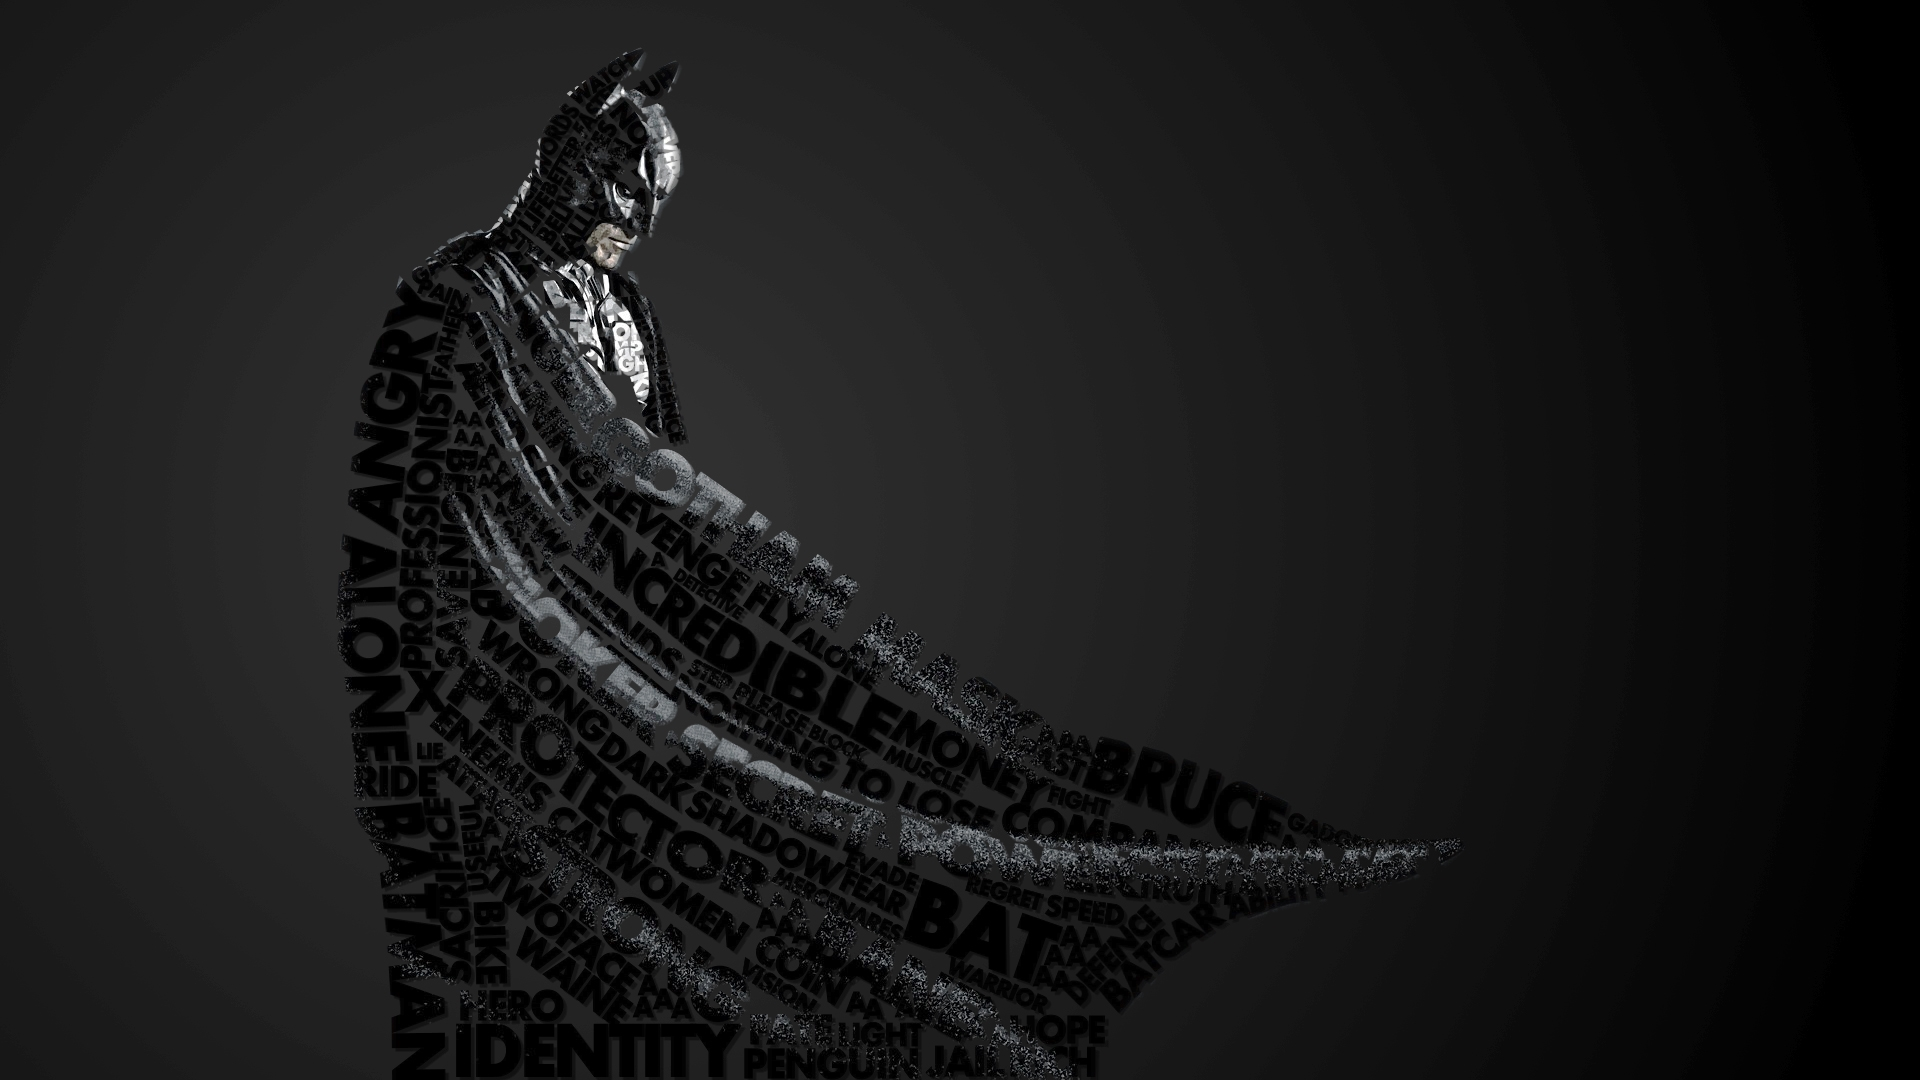 Batman Hd Free Download Wallpaper